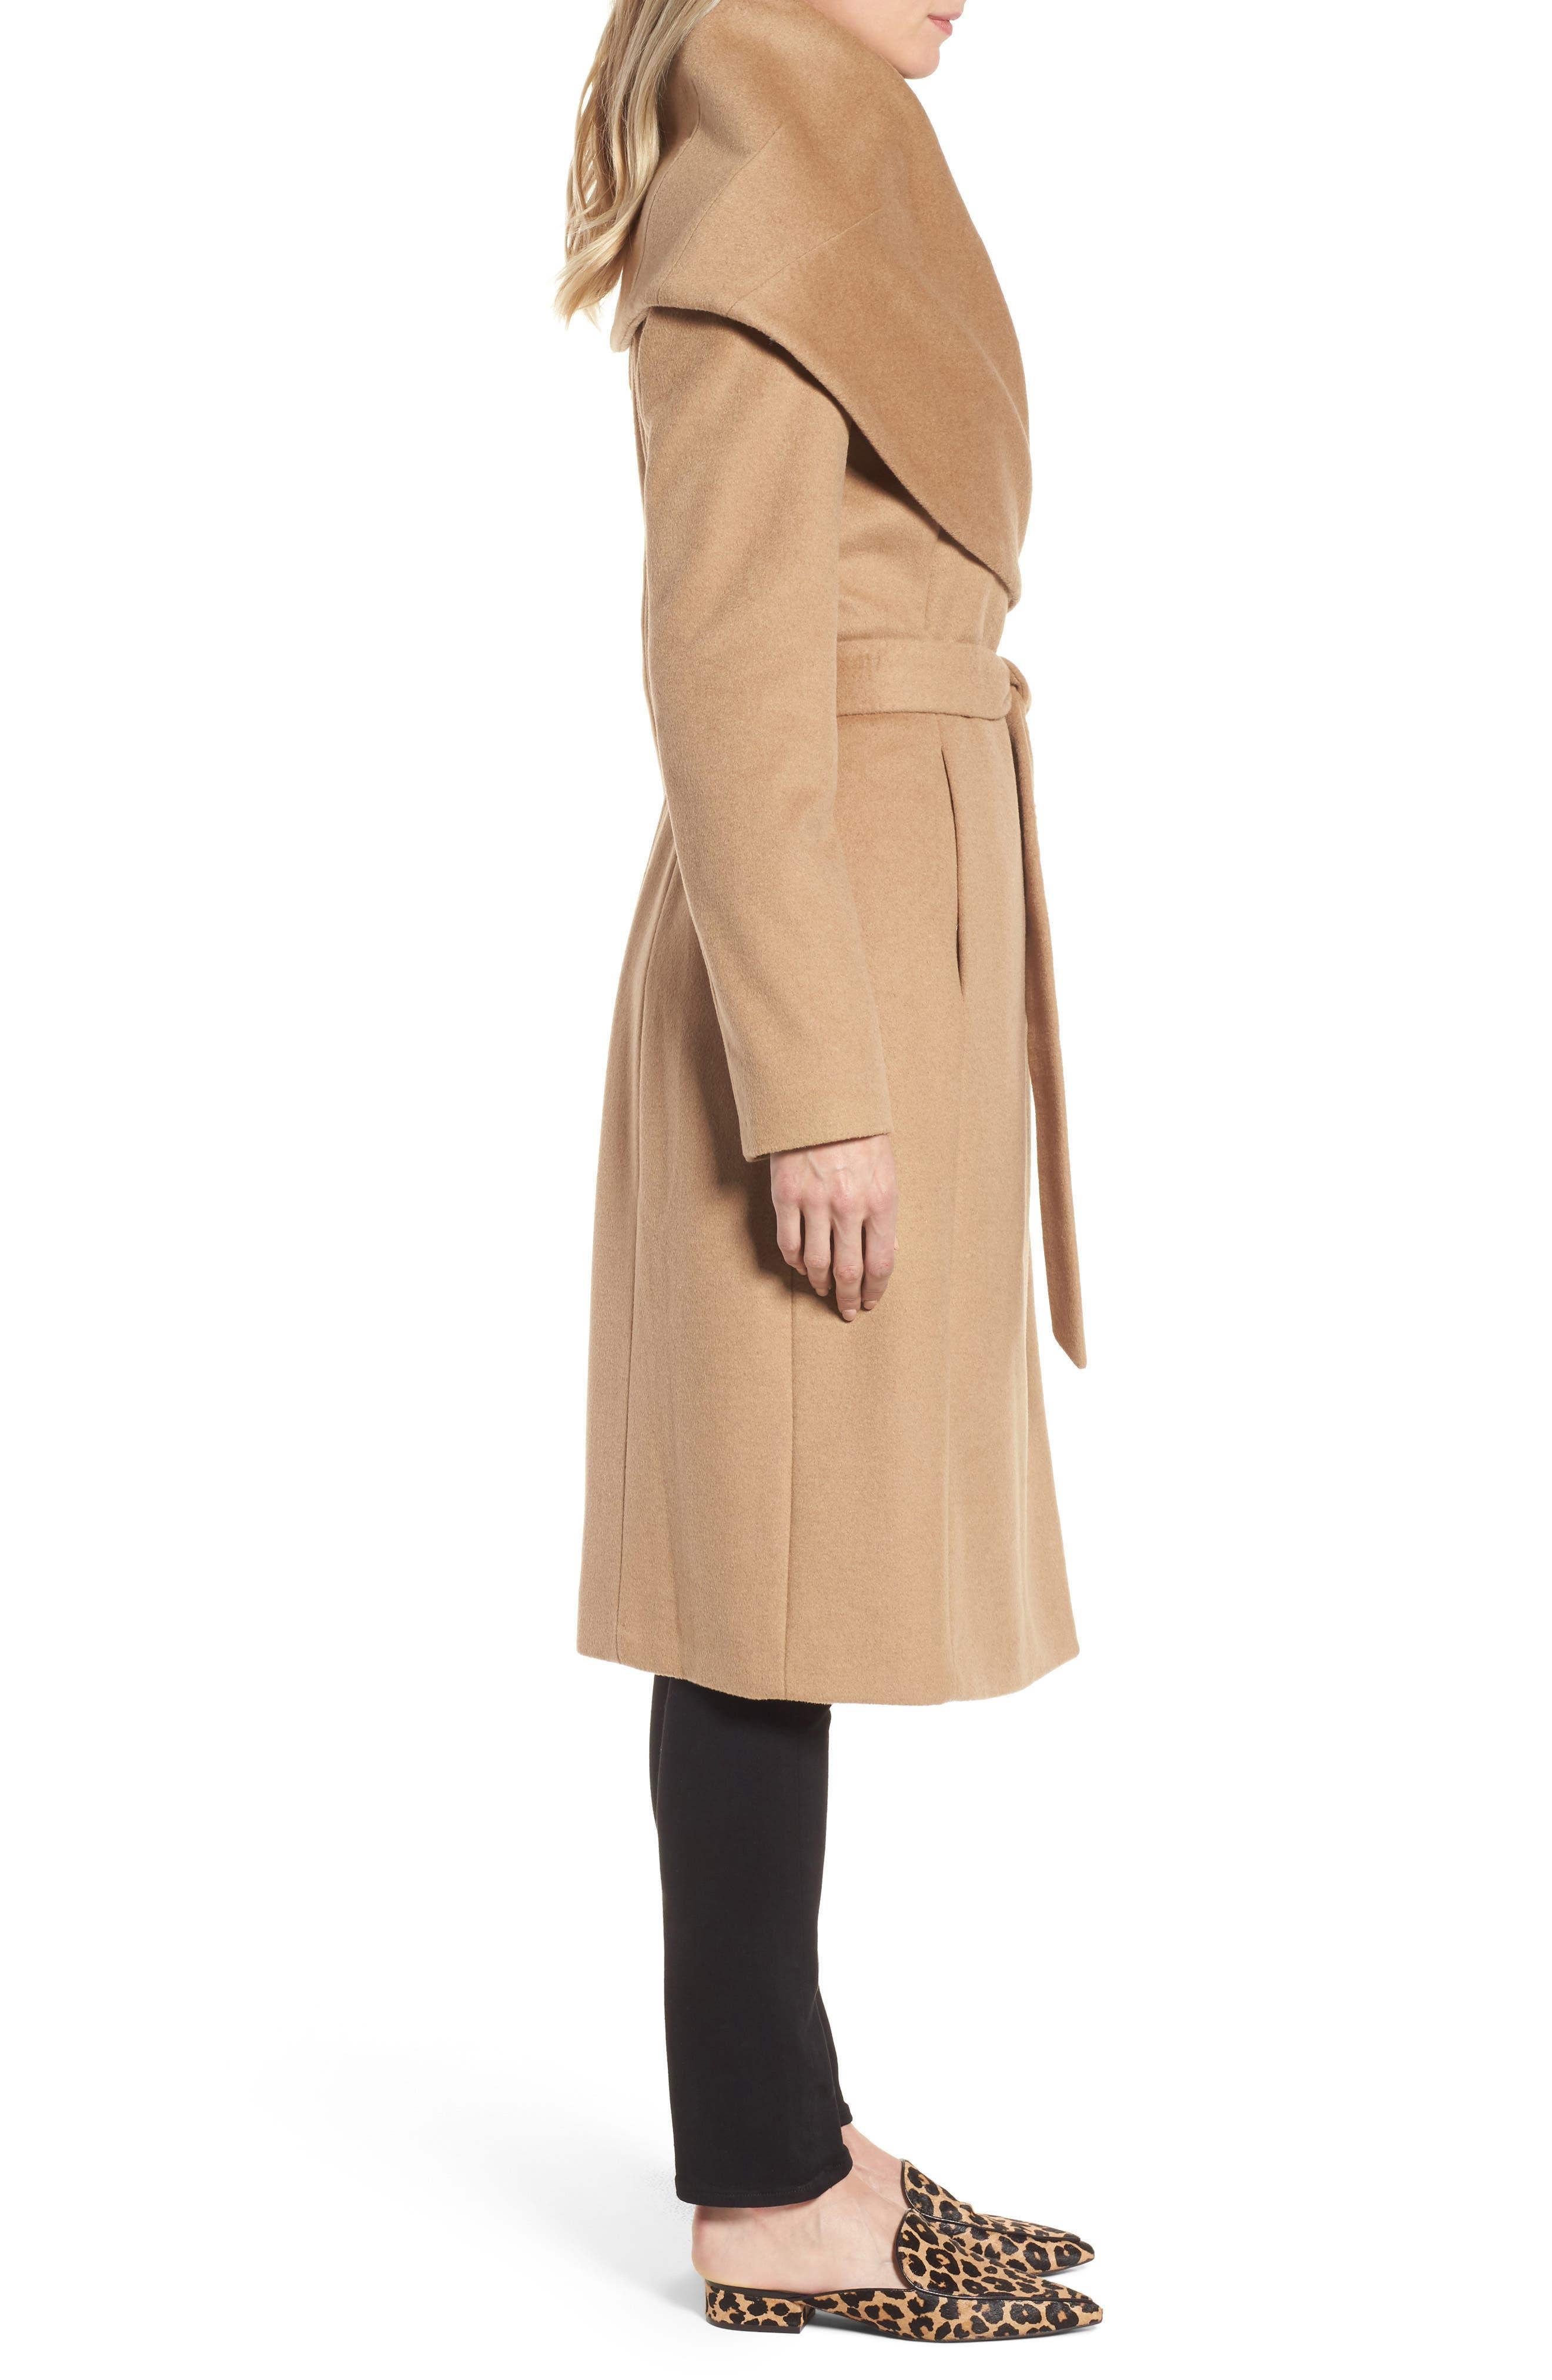 DKNY Wool Blend Shawl Collar Wrap Coat,                             Alternate thumbnail 3, color,                             252